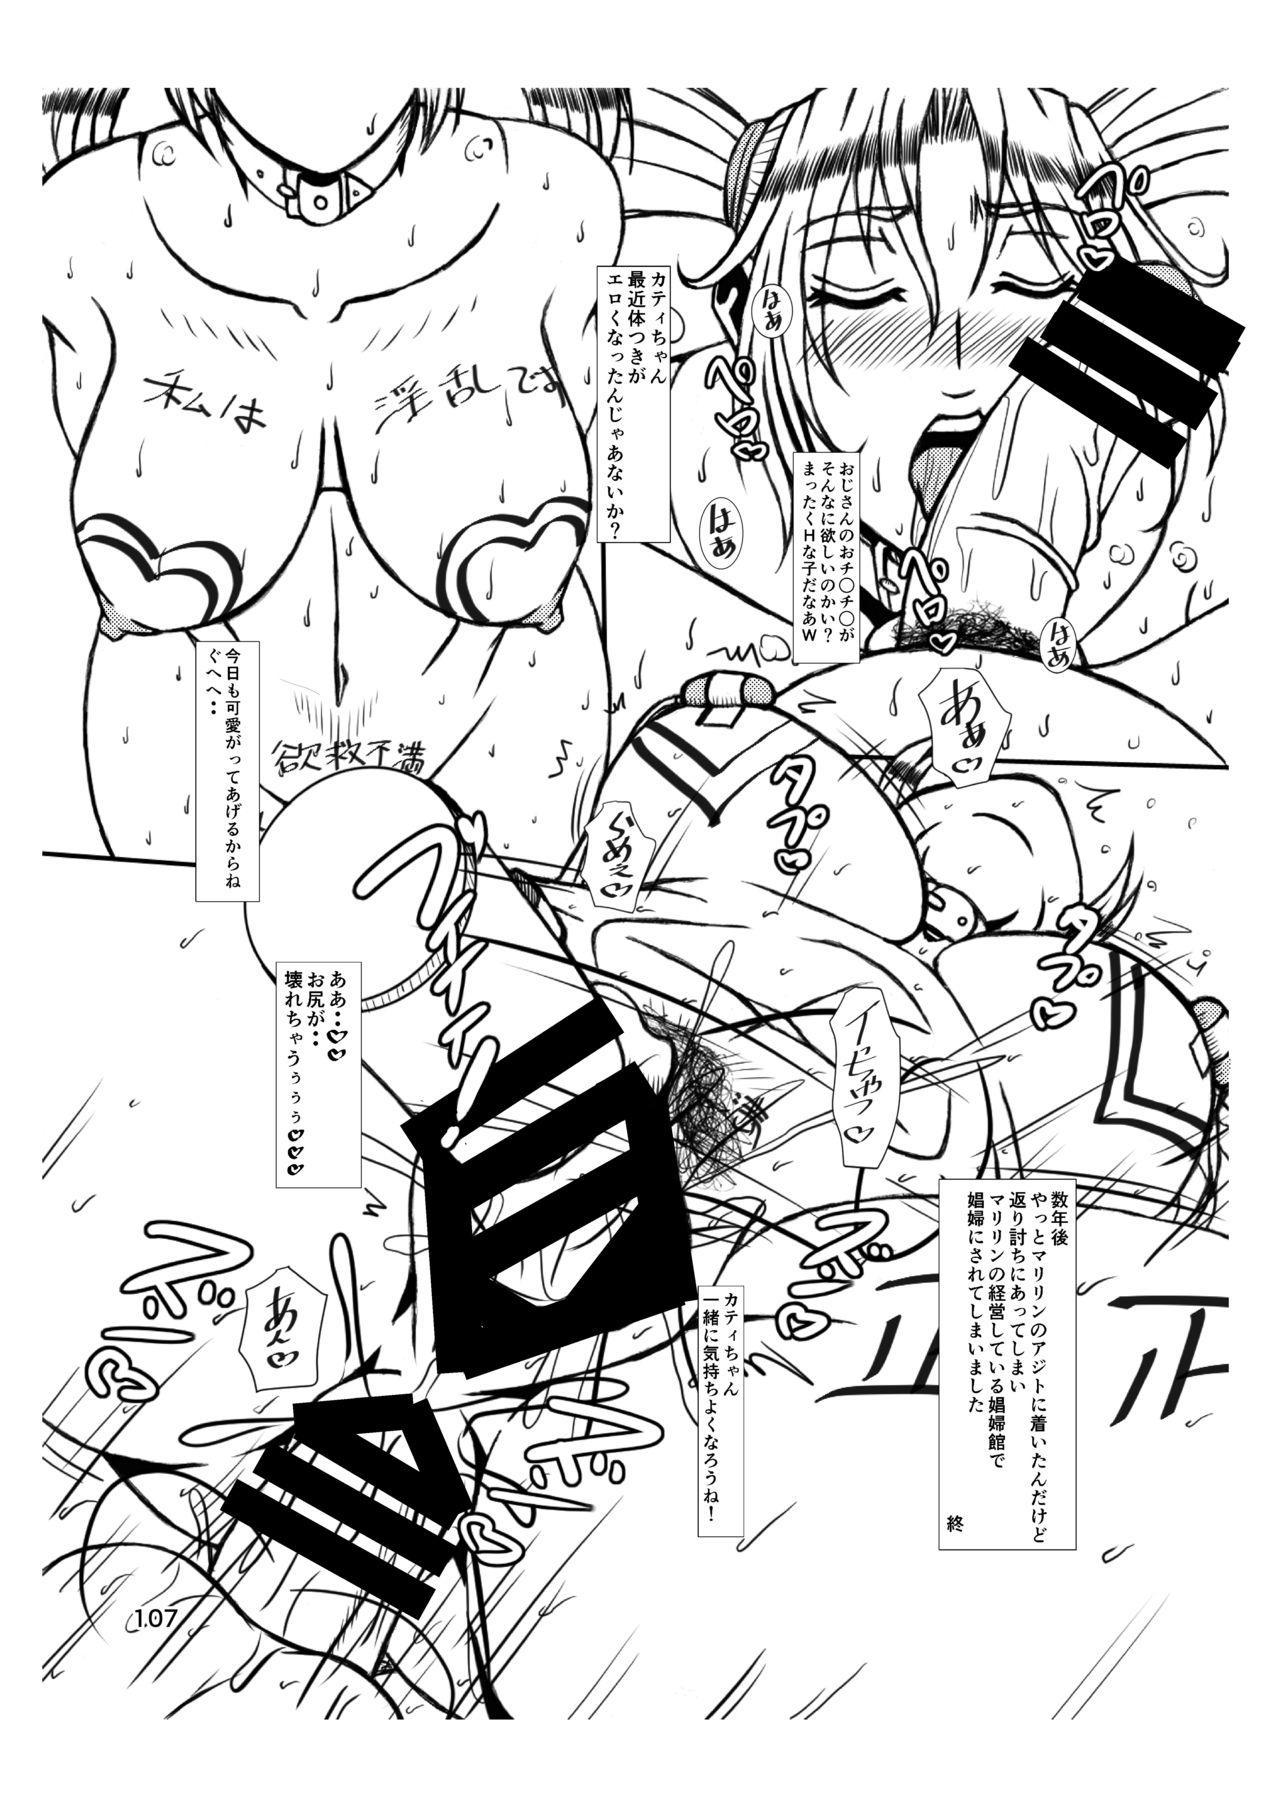 Akatsuki Blitzkampf & EN-1 Perfekt Welt Gangbang Anthology 106